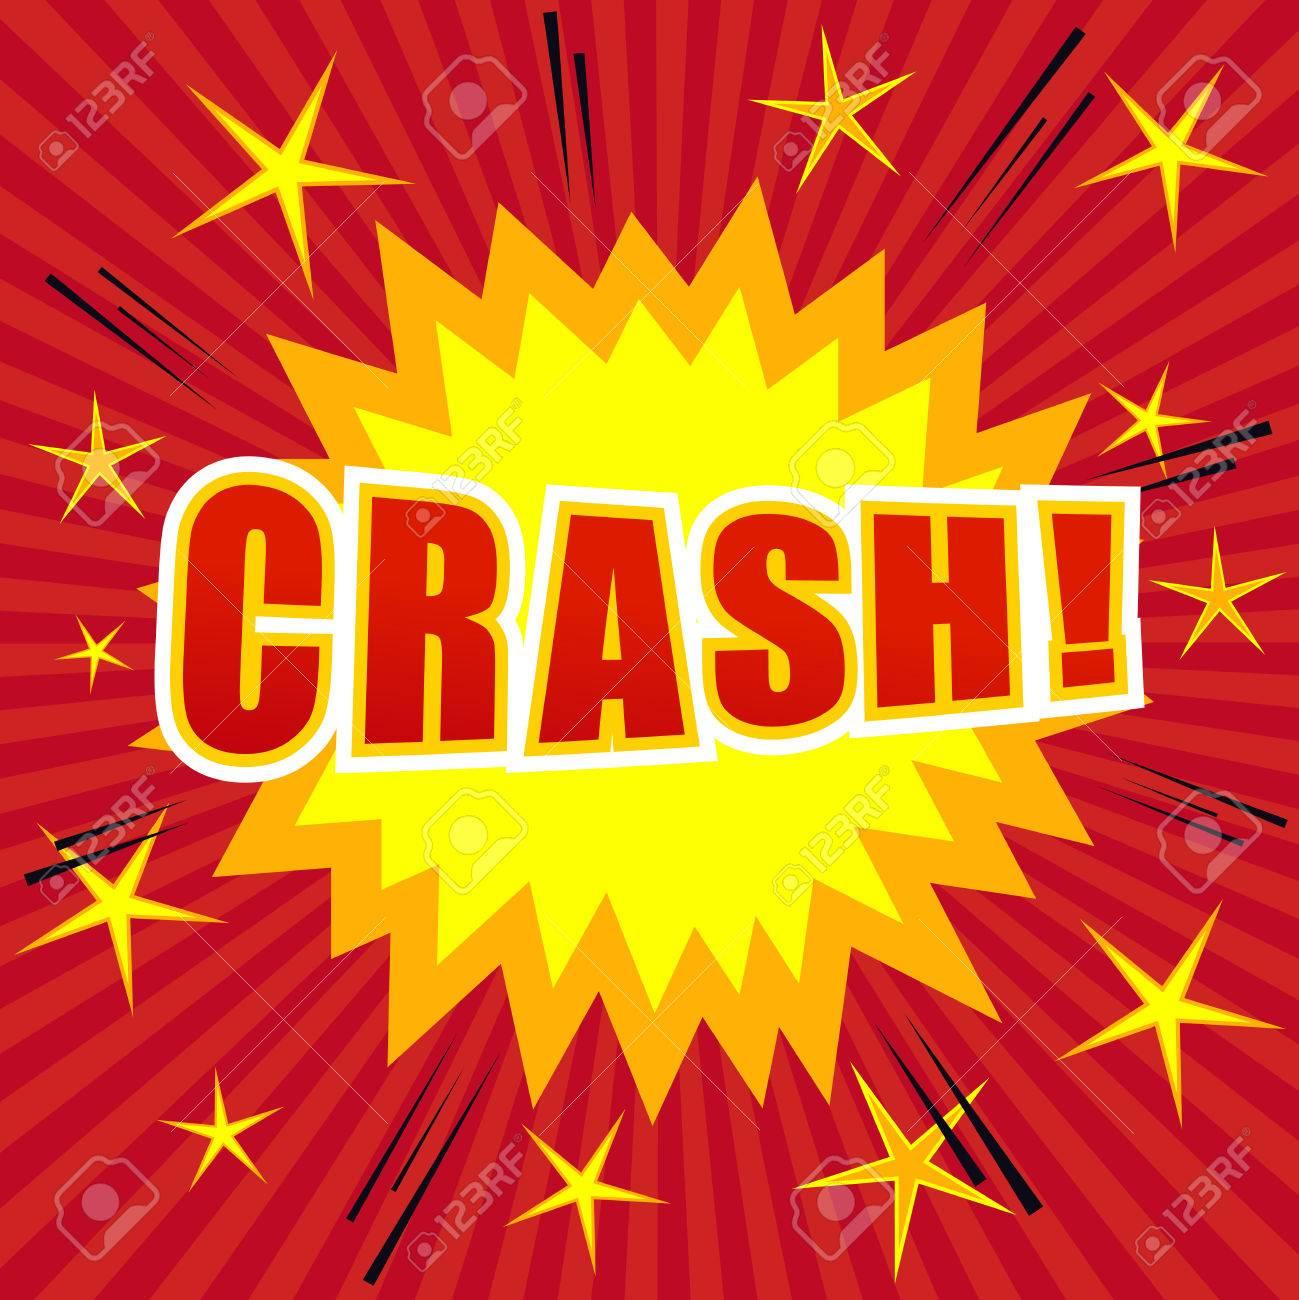 Crash comic cartoon  Pop-art style  The illustration with stars,